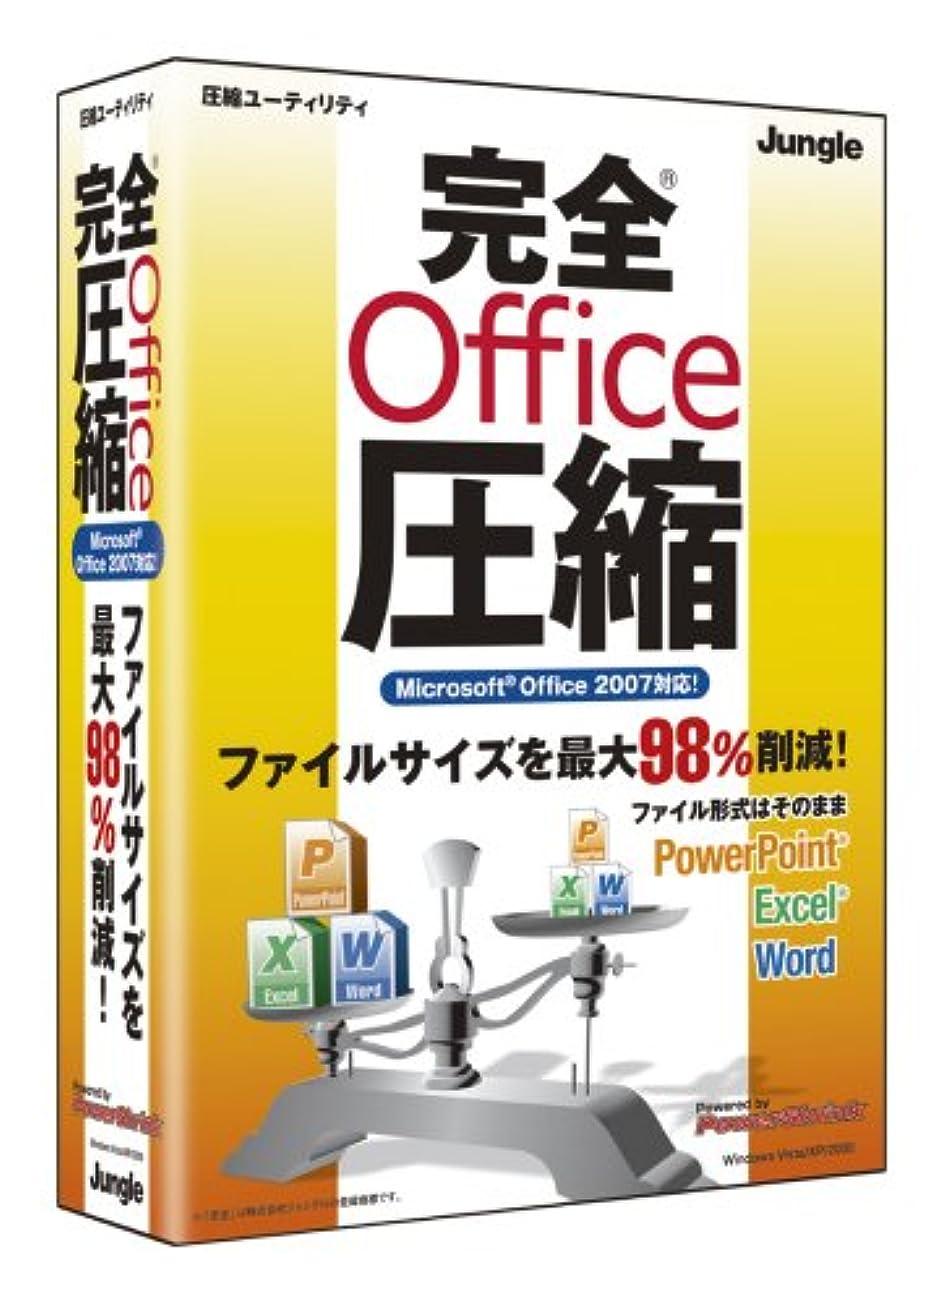 完全Office圧縮